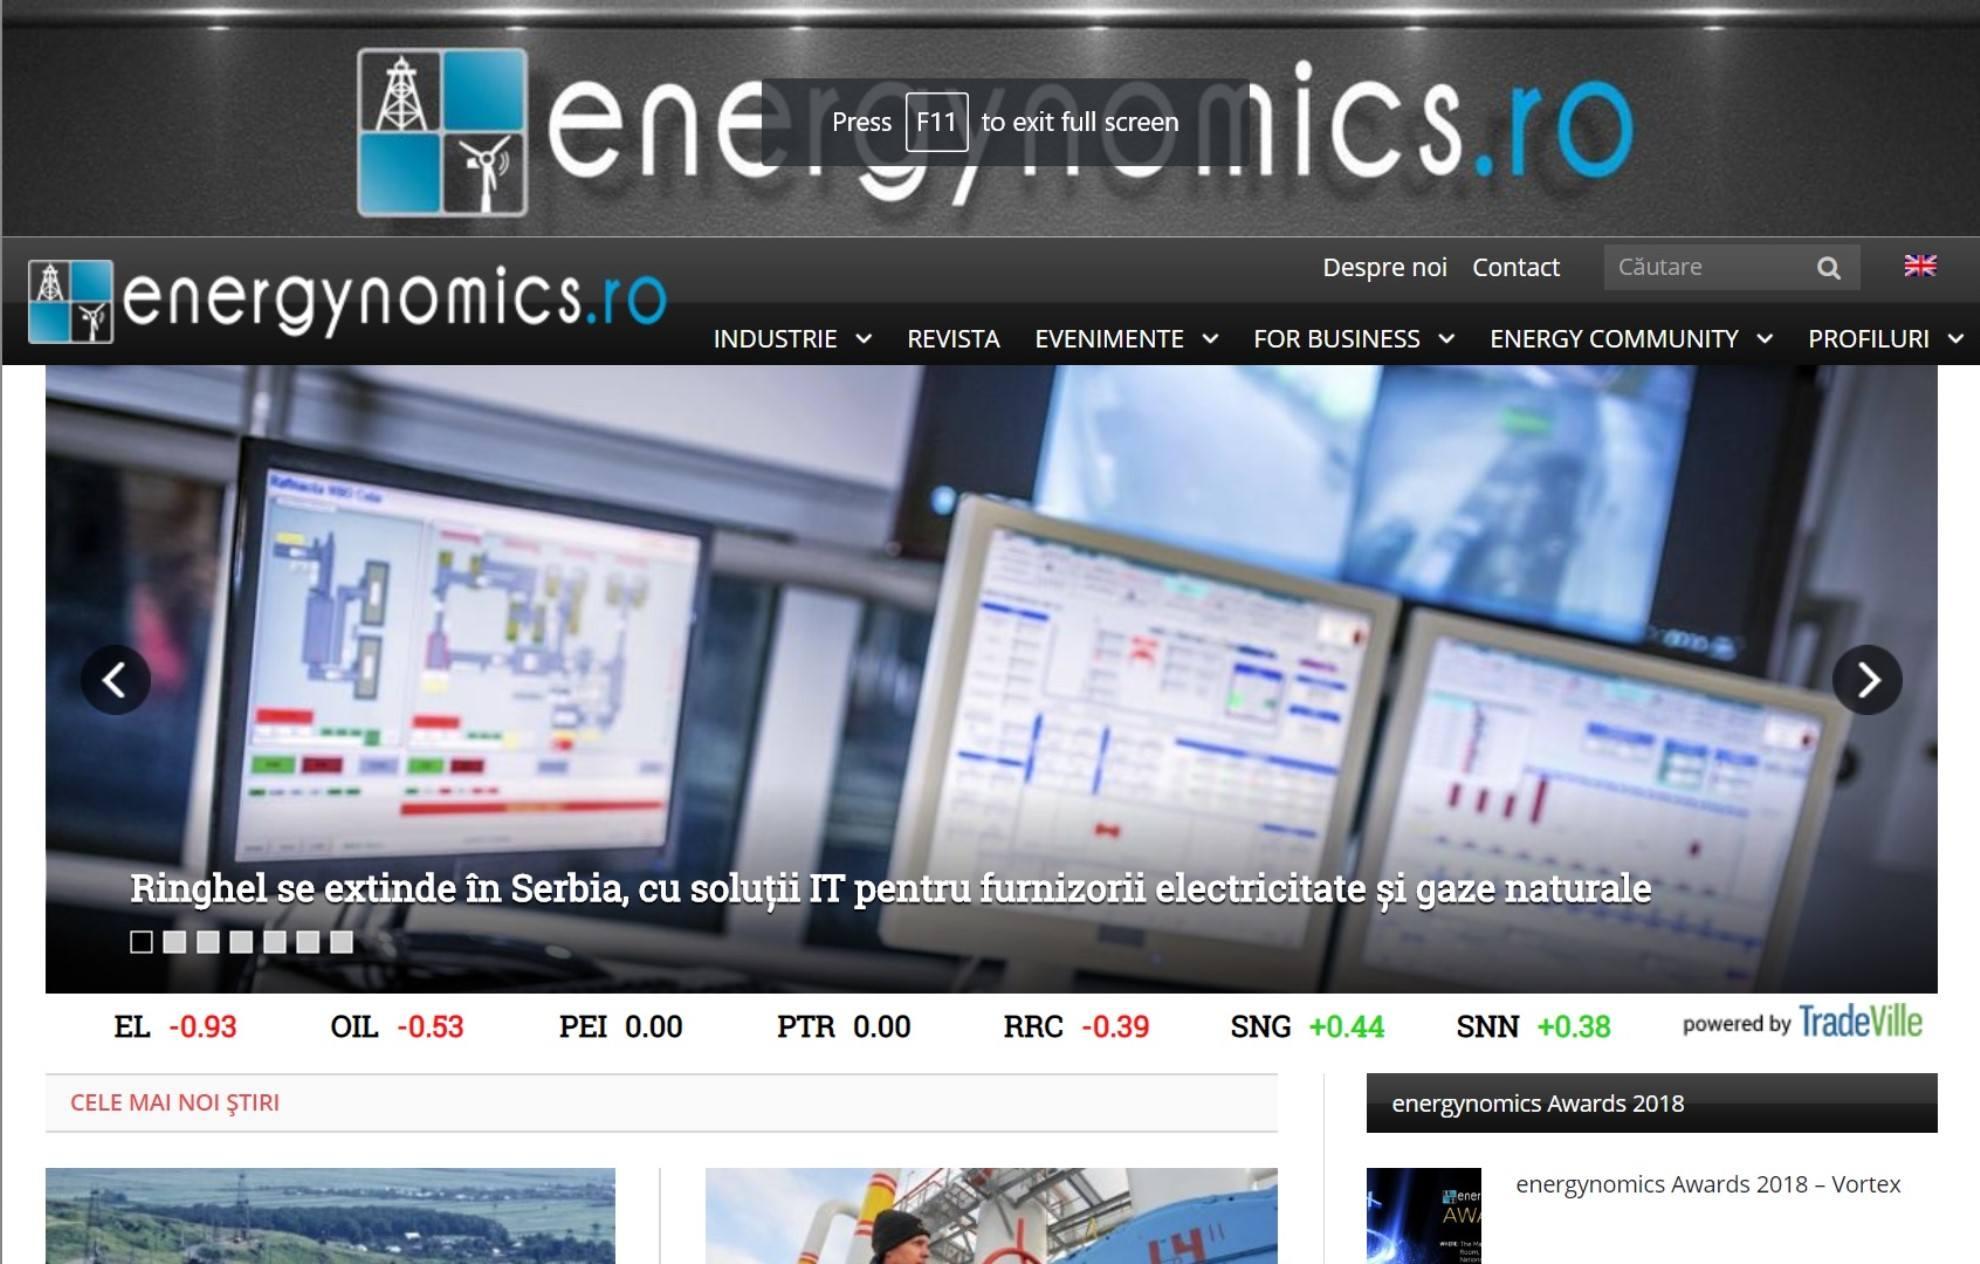 energynomics.ro - portalul B2B al energeticii româneşti